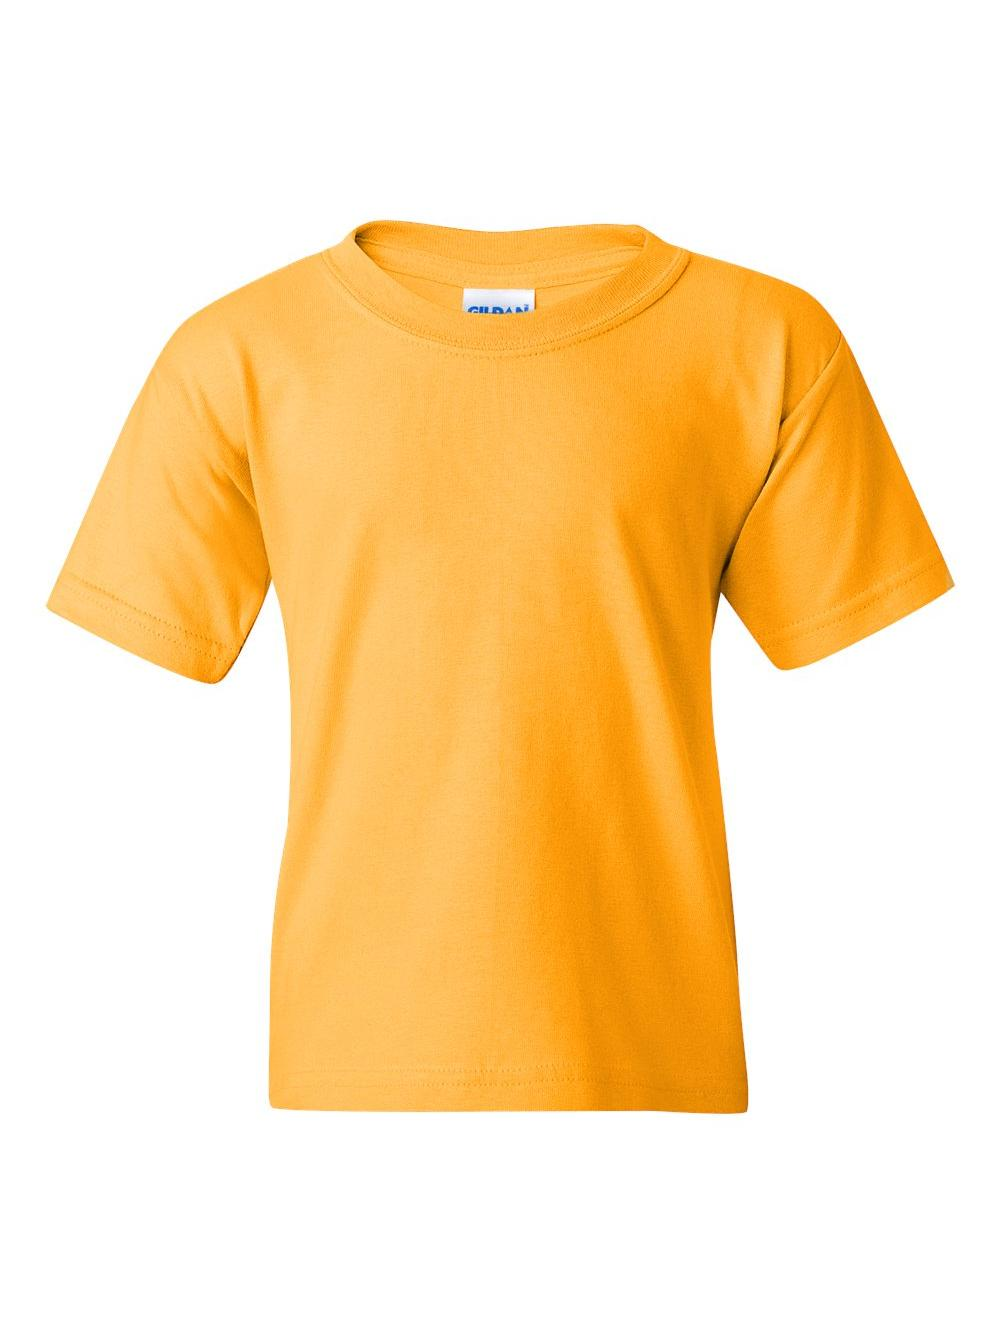 Gildan Activewear Heavy Cotton Youth Tee Shirt. Mint Green. XL.